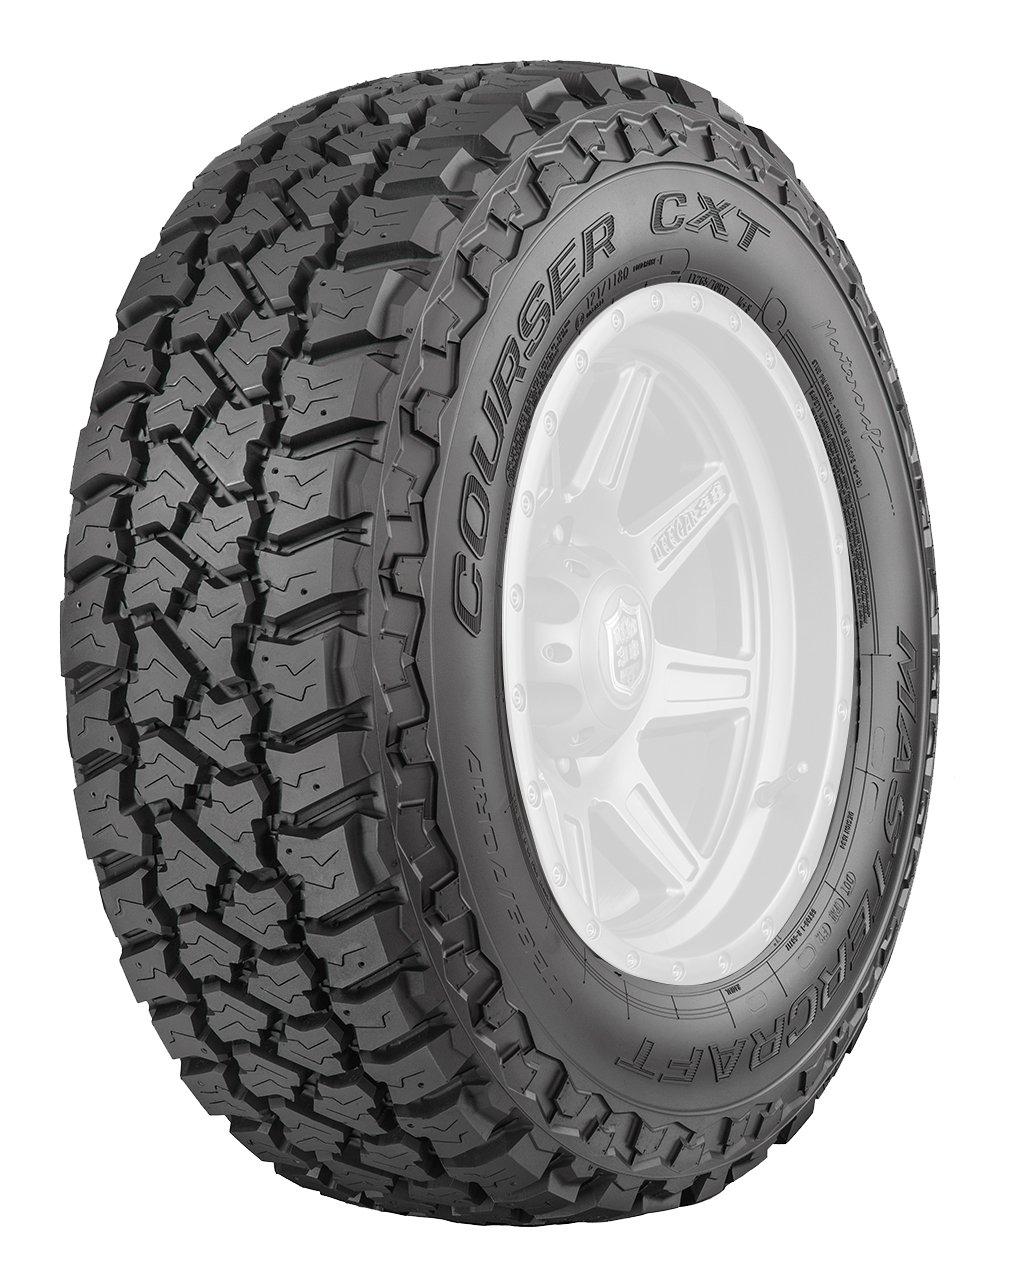 Mastercraft Courser CXT All-Terrain Radial Tire - 265/70R17 121Q